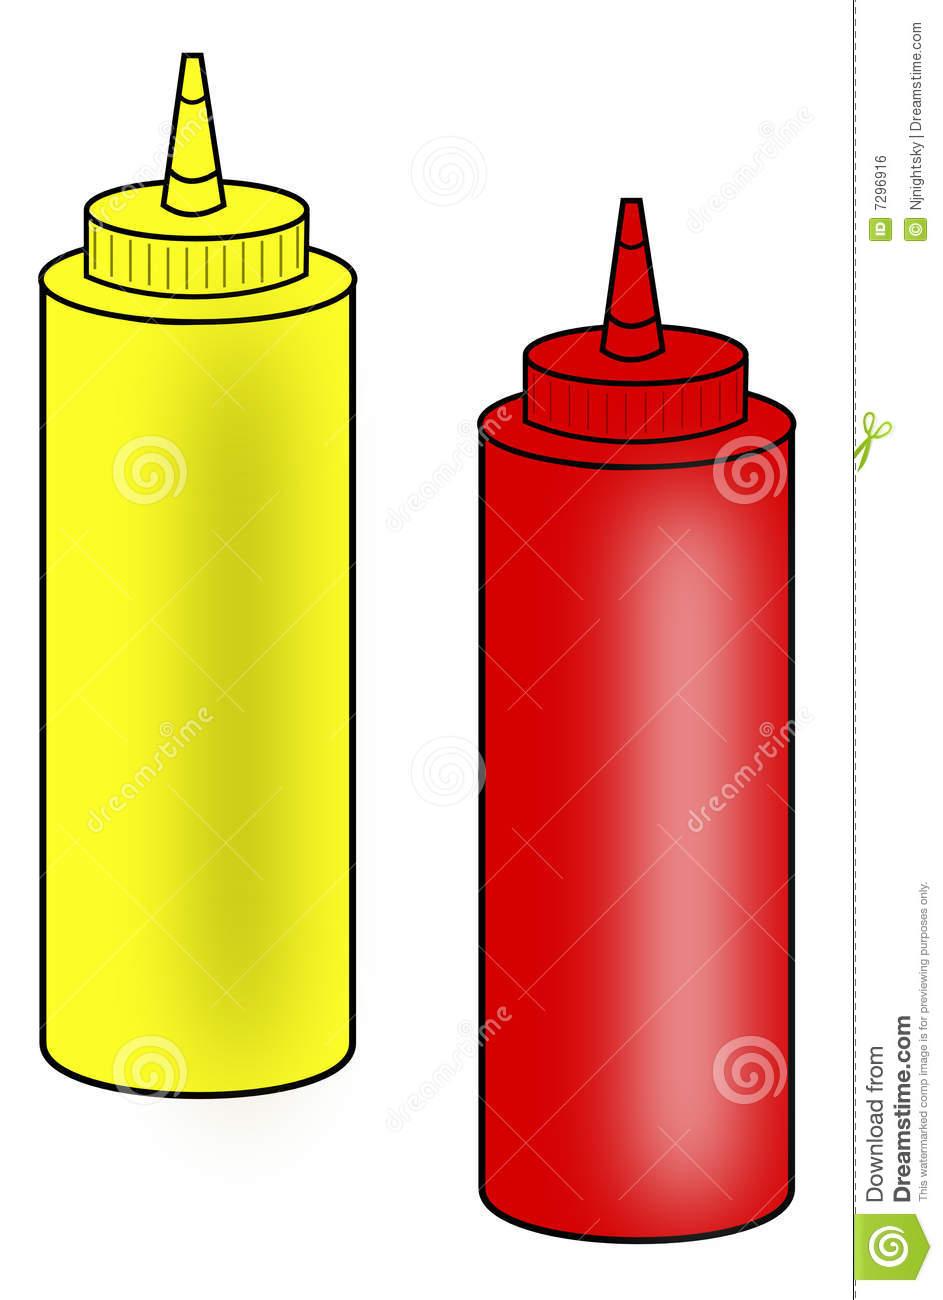 943x1300 Bottle Clipart Ketchup Bottle